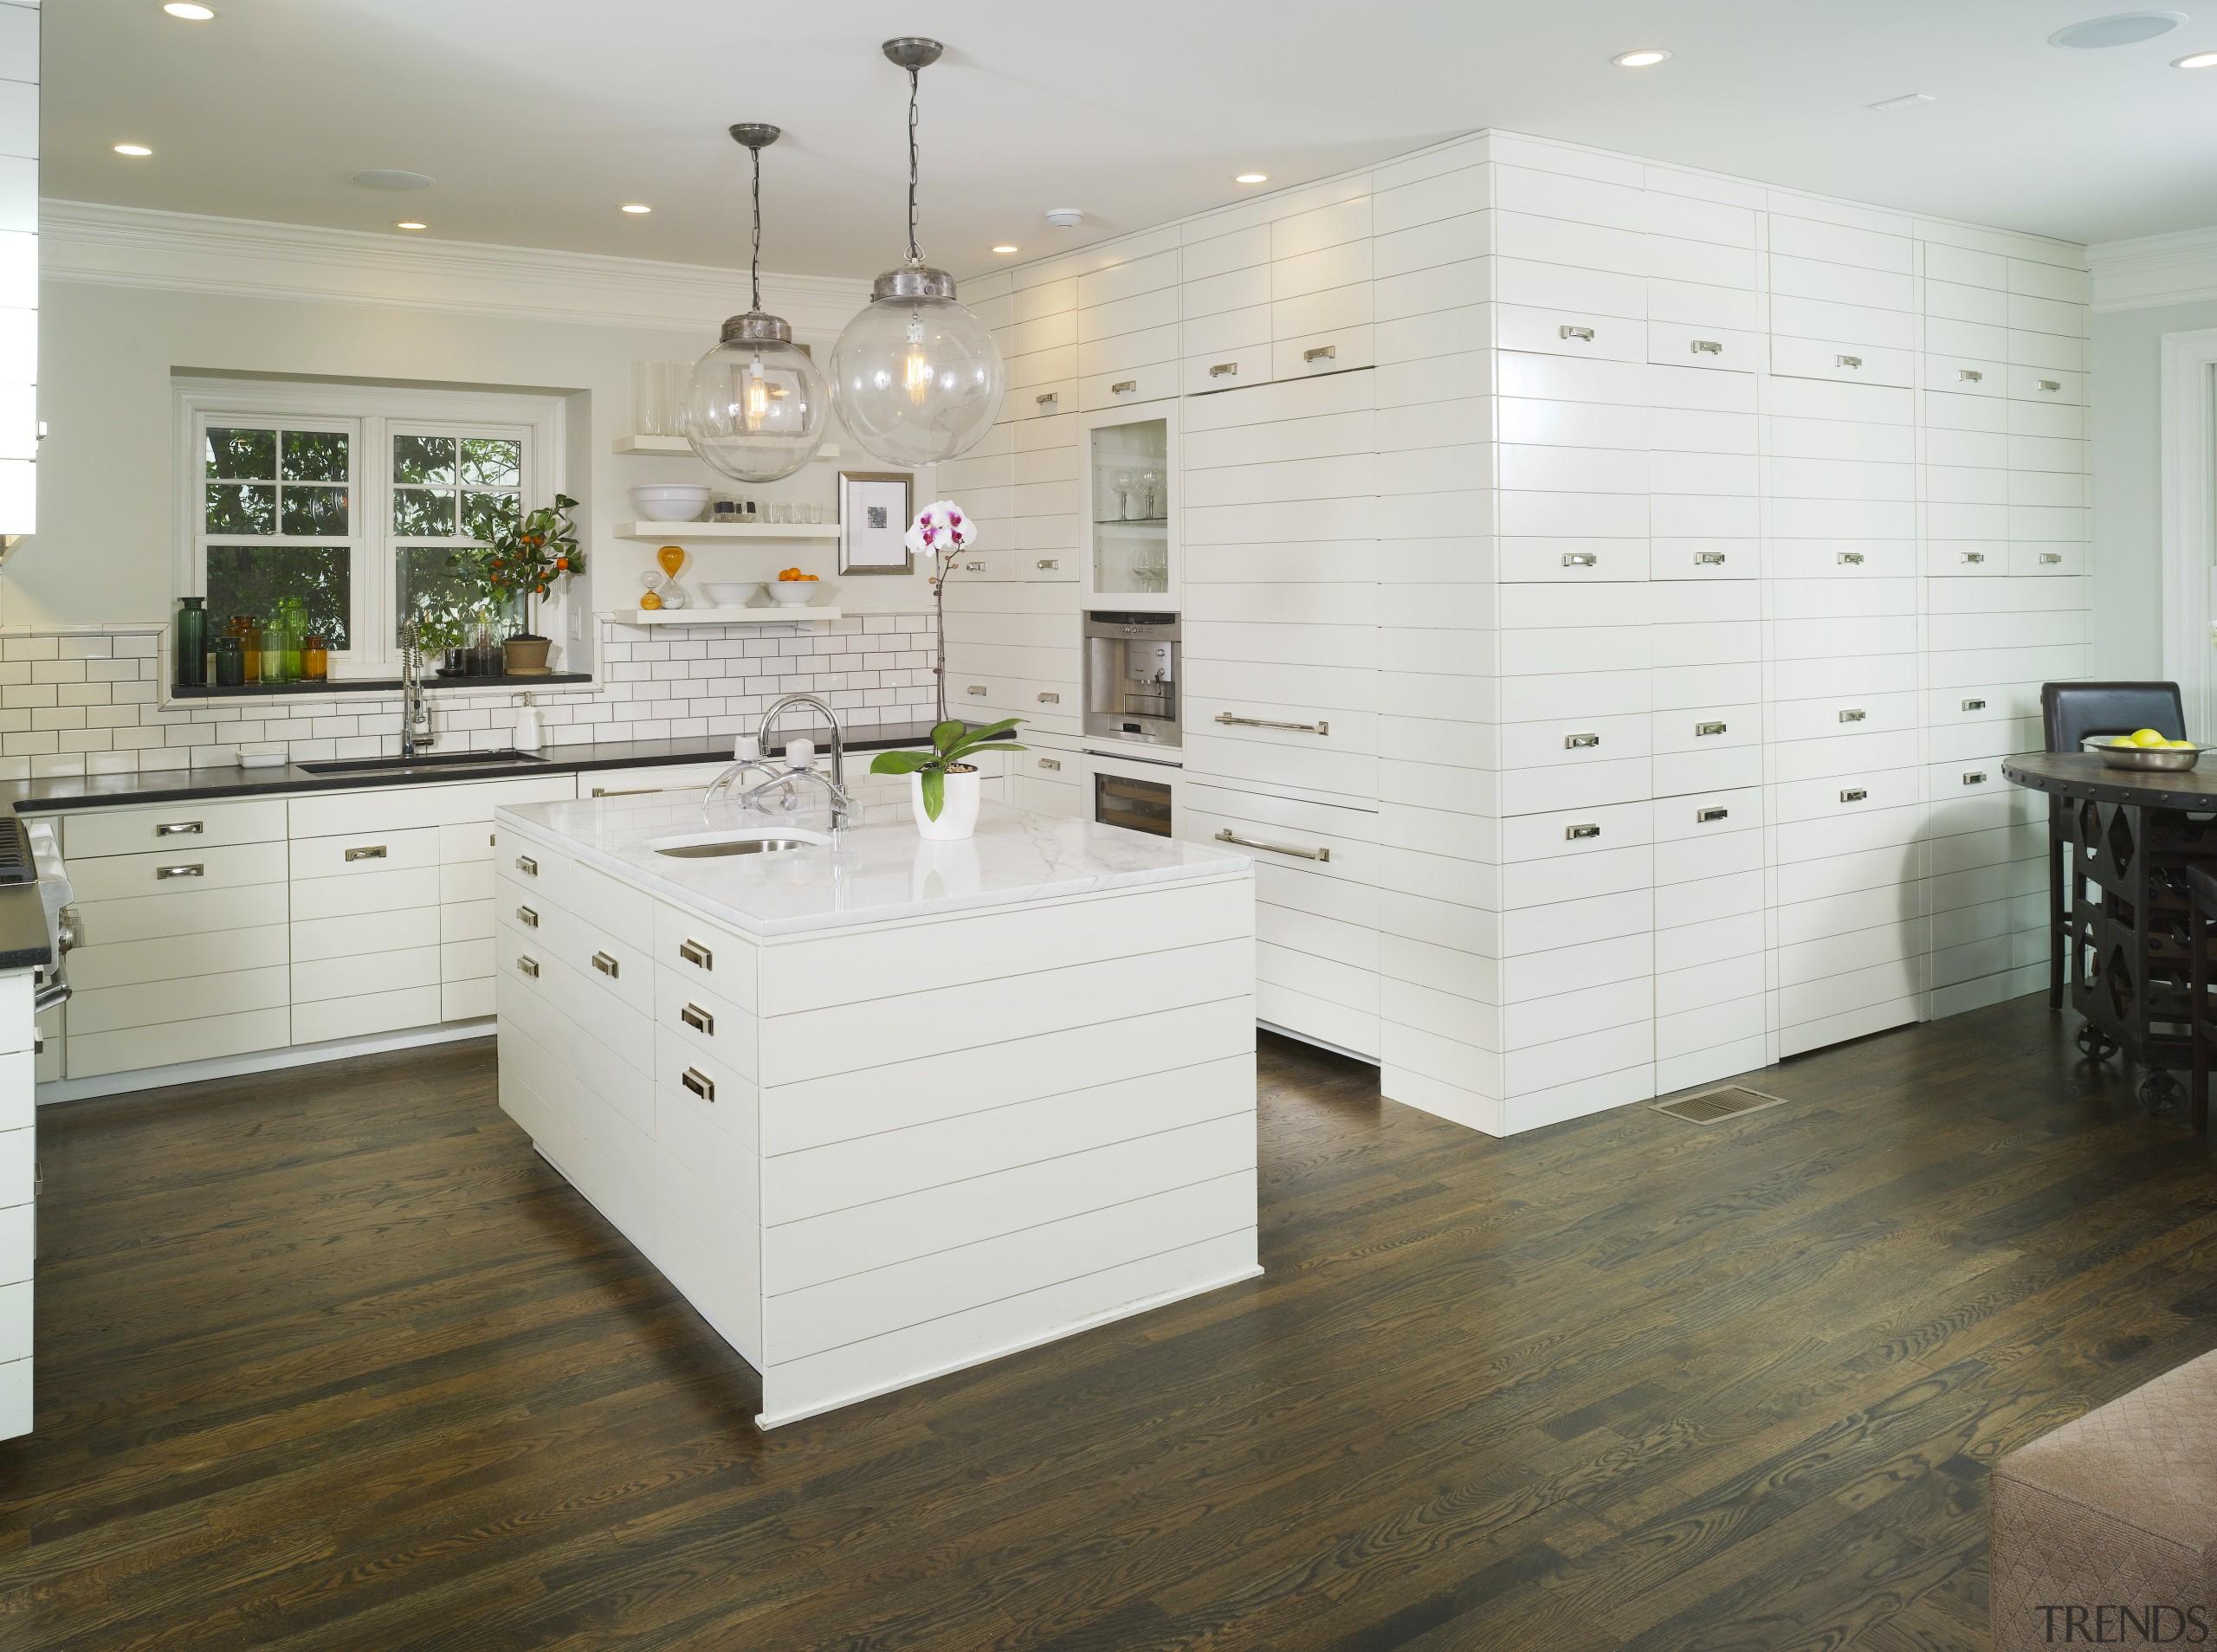 View of kitchen by Designer Willis Watts. Remodelled cabinetry, countertop, floor, flooring, furniture, hardwood, interior design, kitchen, laminate flooring, room, tile, wall, wood, wood flooring, white, gray